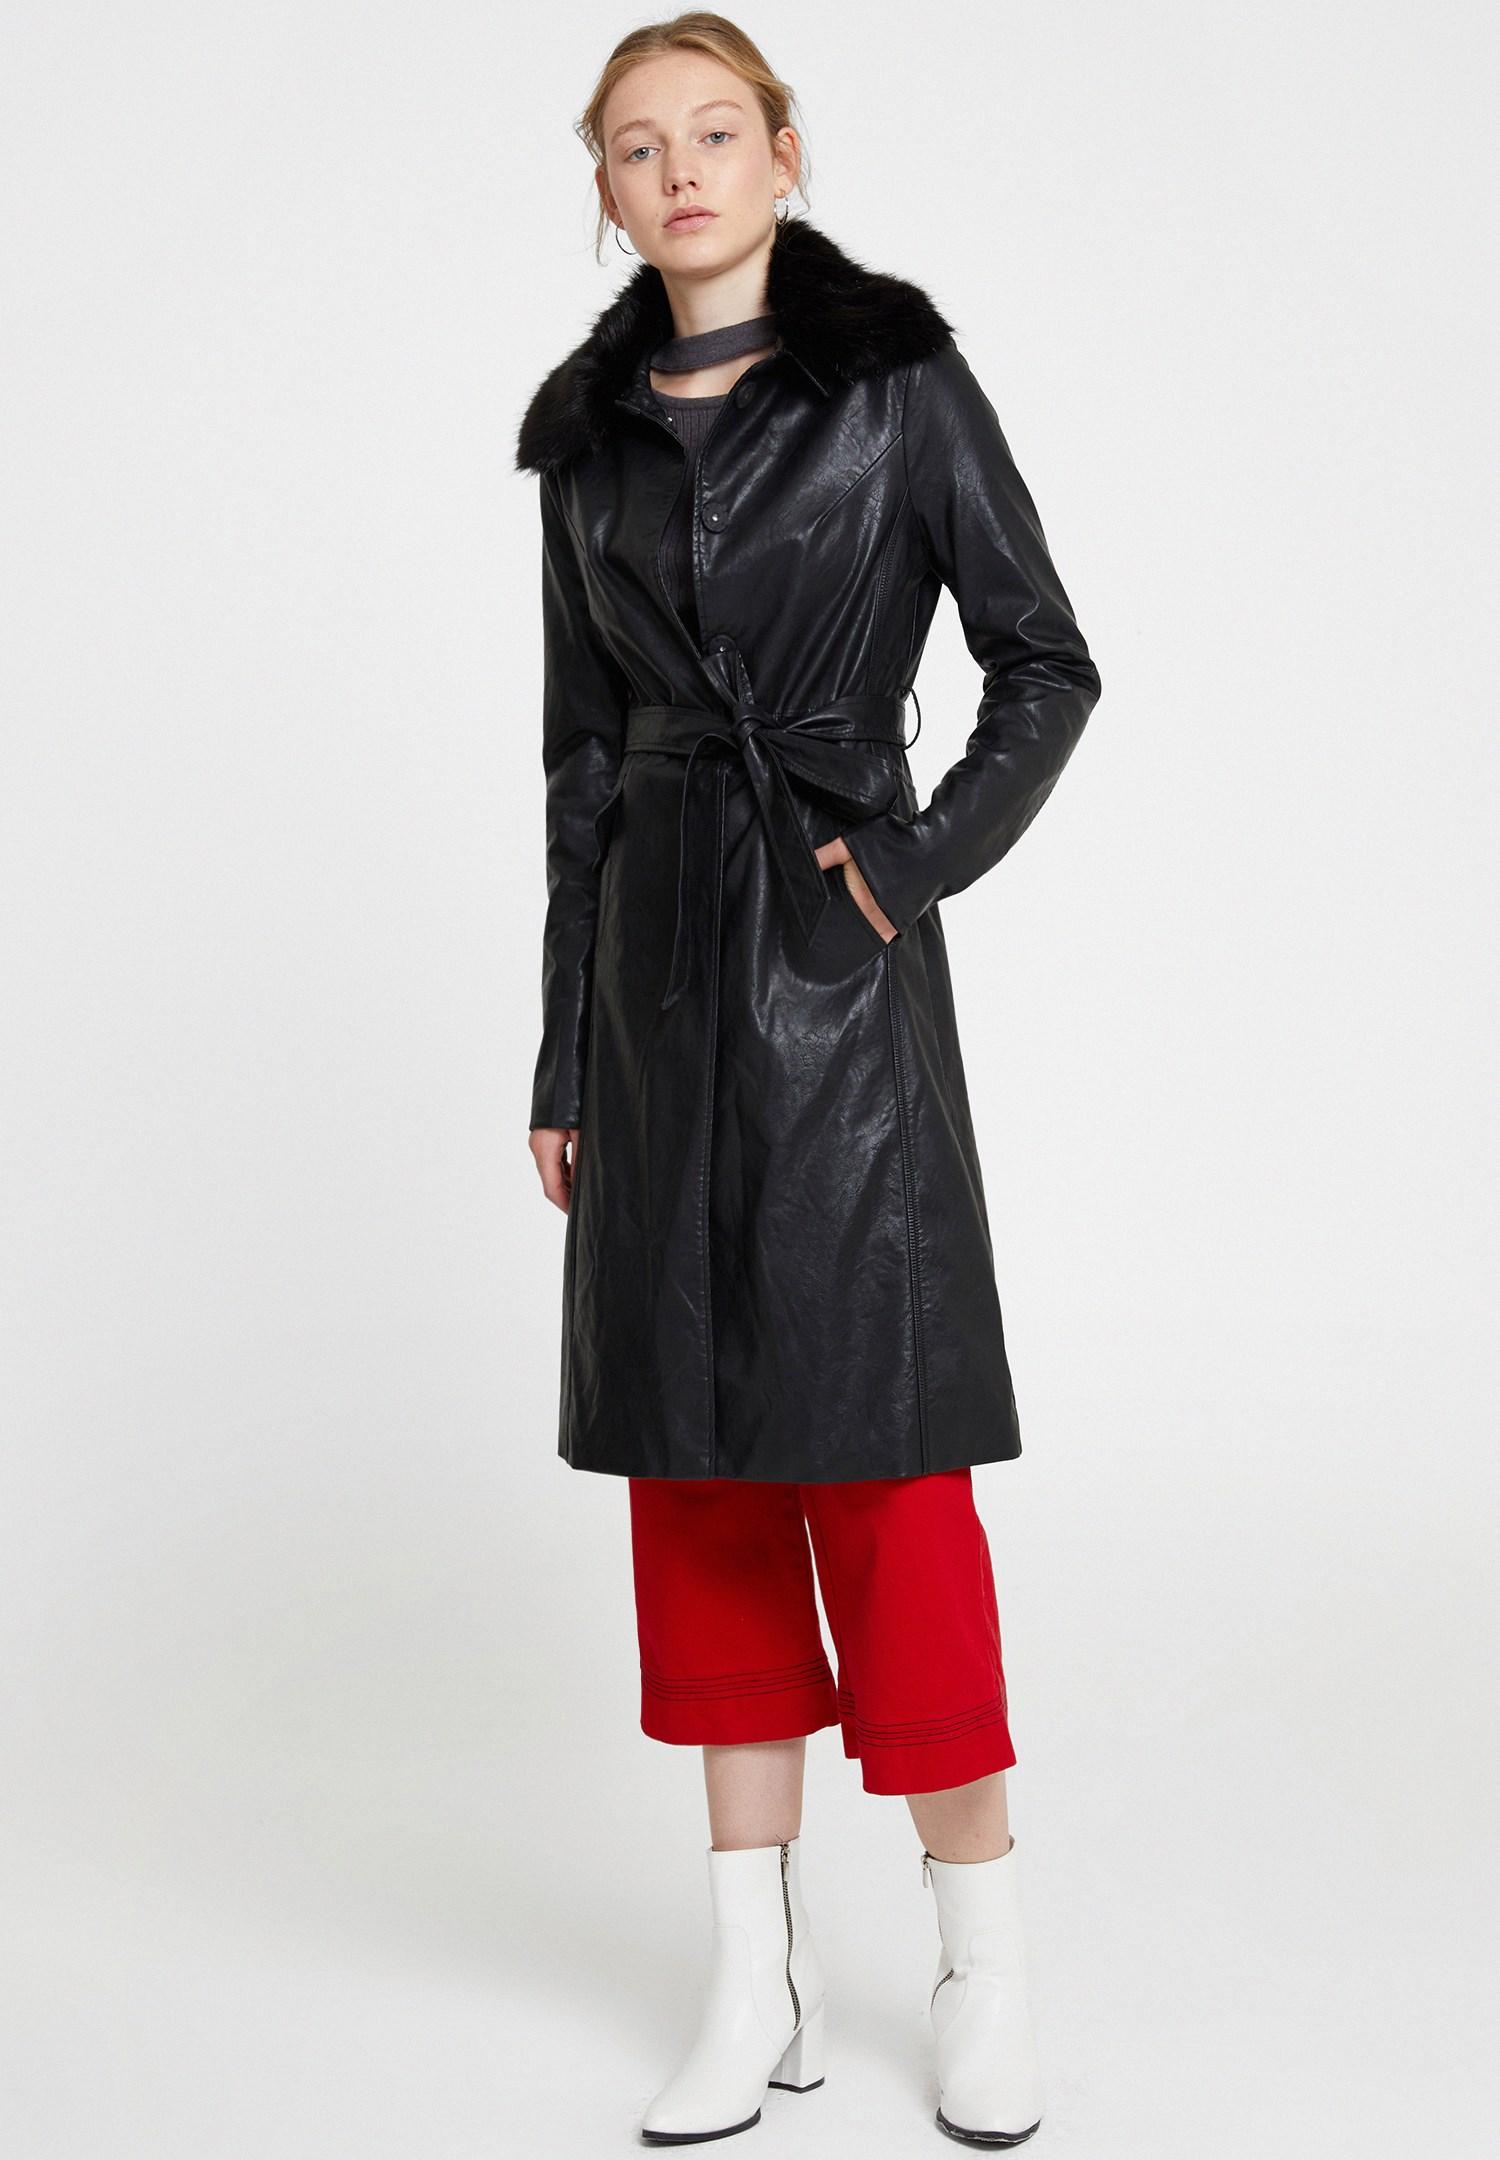 Women Black Leather Jacket with Faux Fur Details